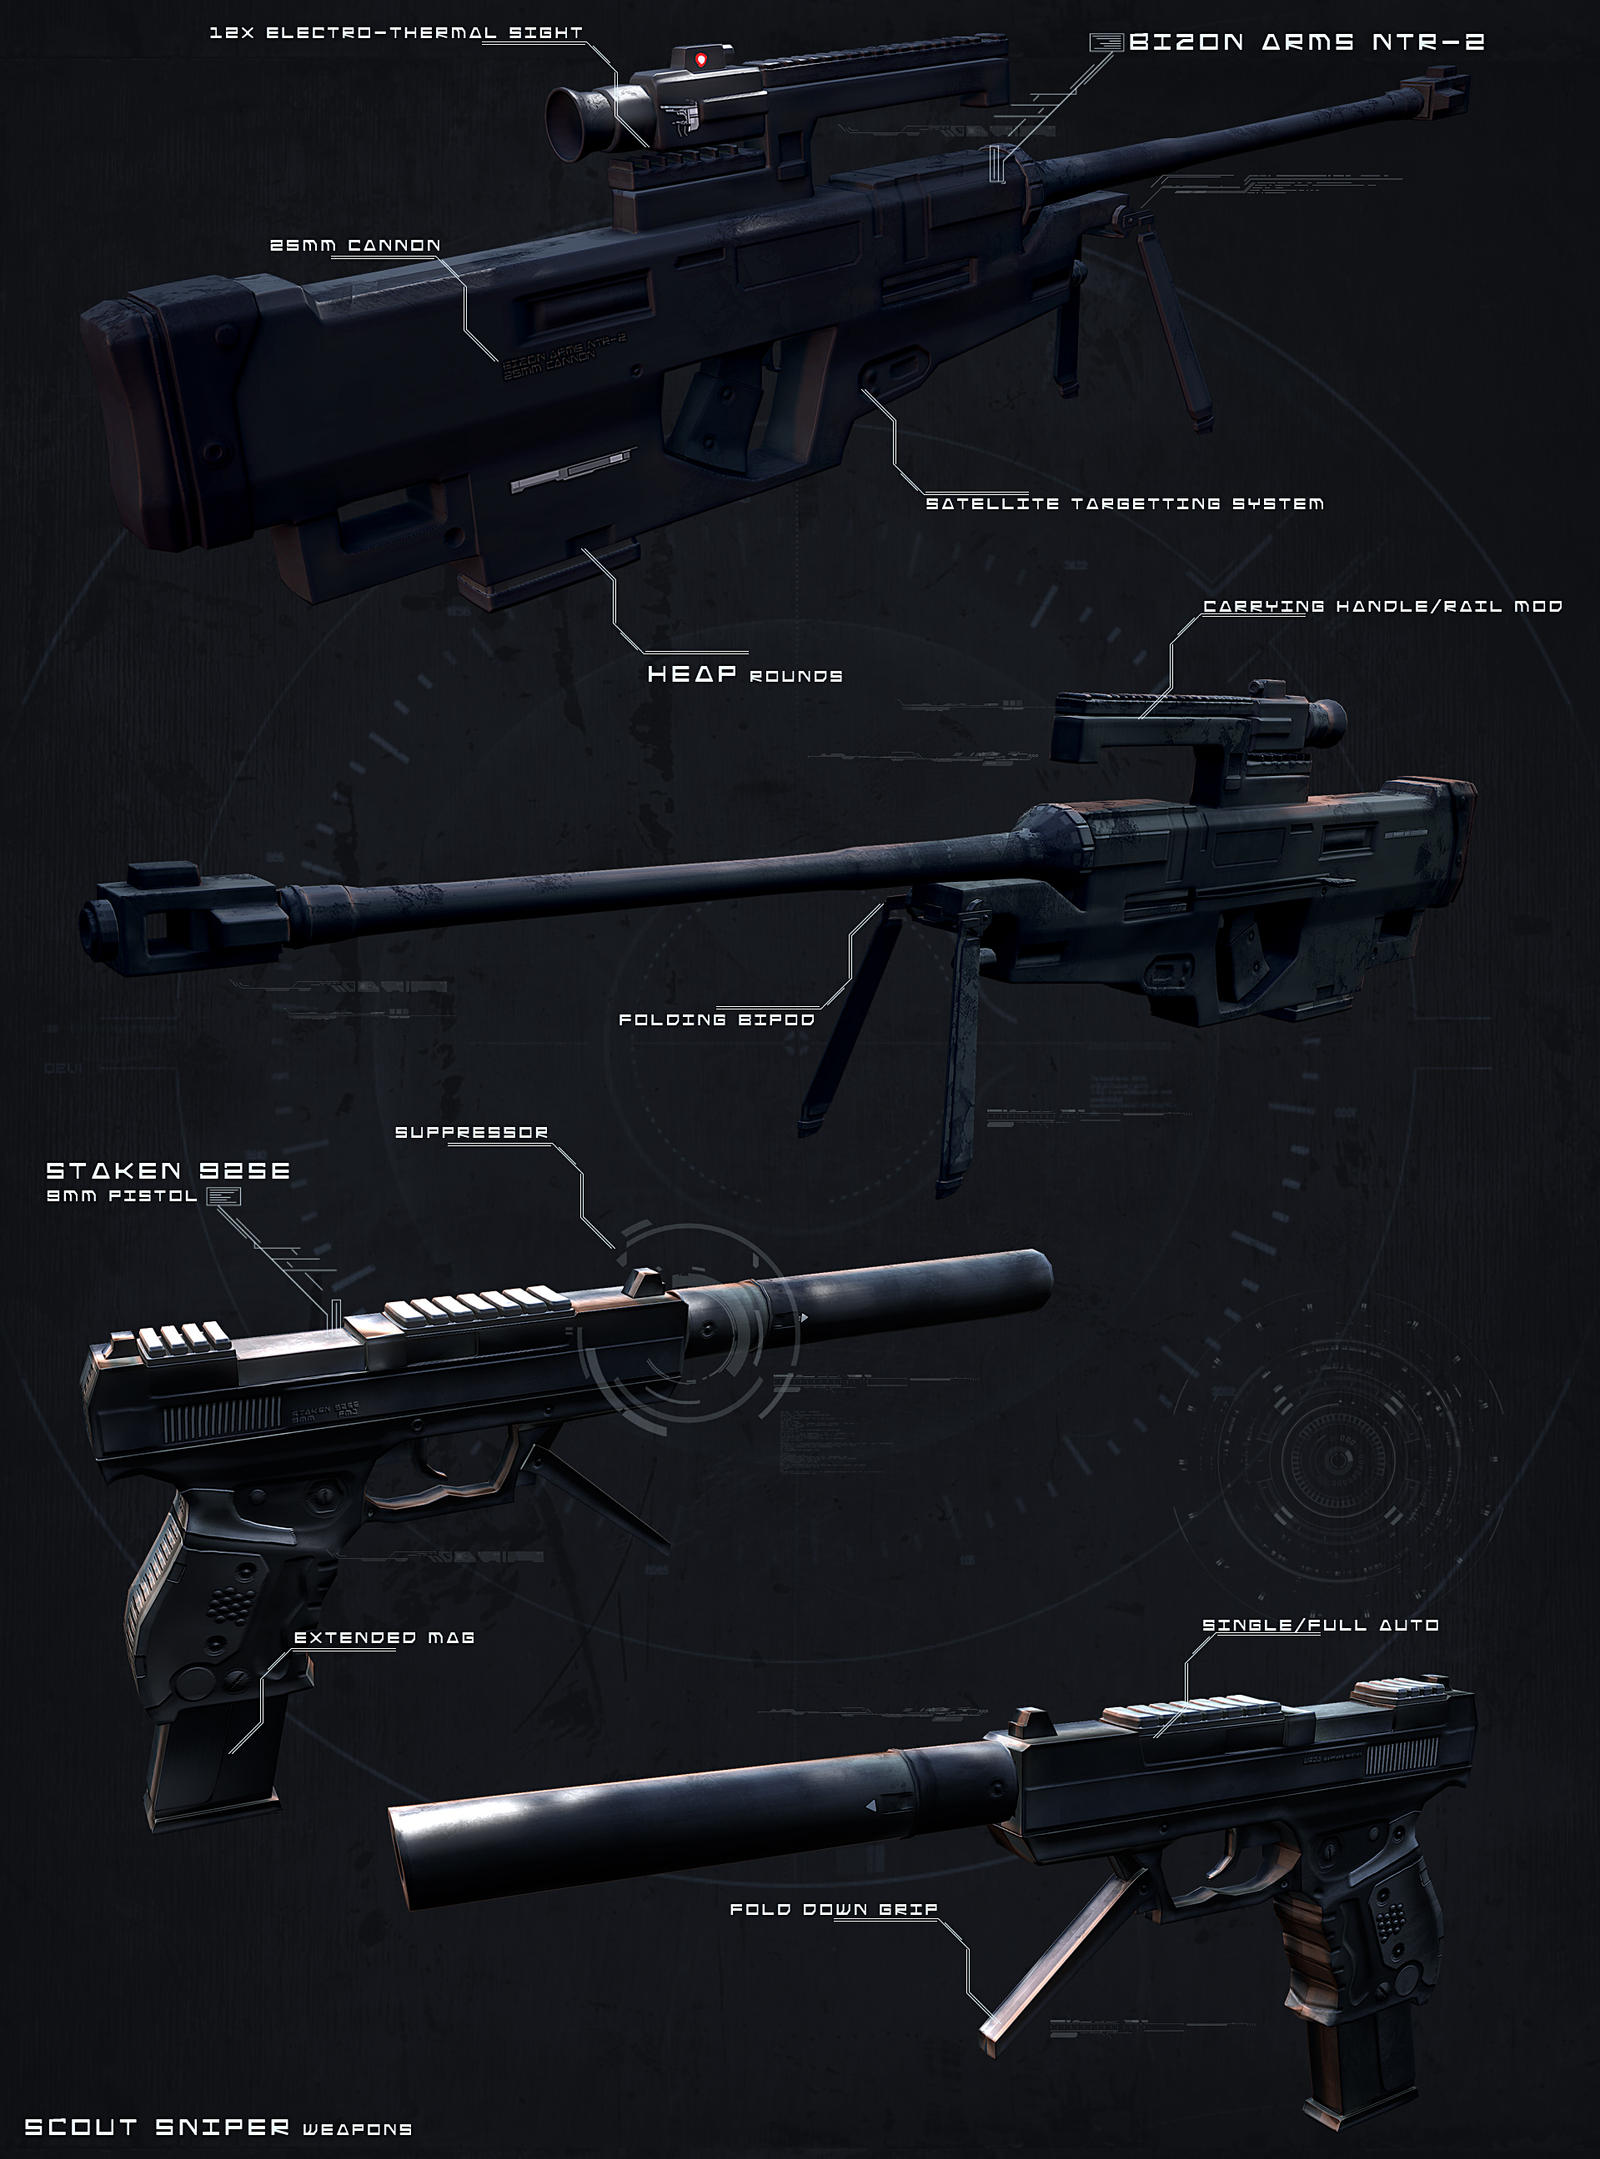 Scout sniper weapons by digitalinkrod